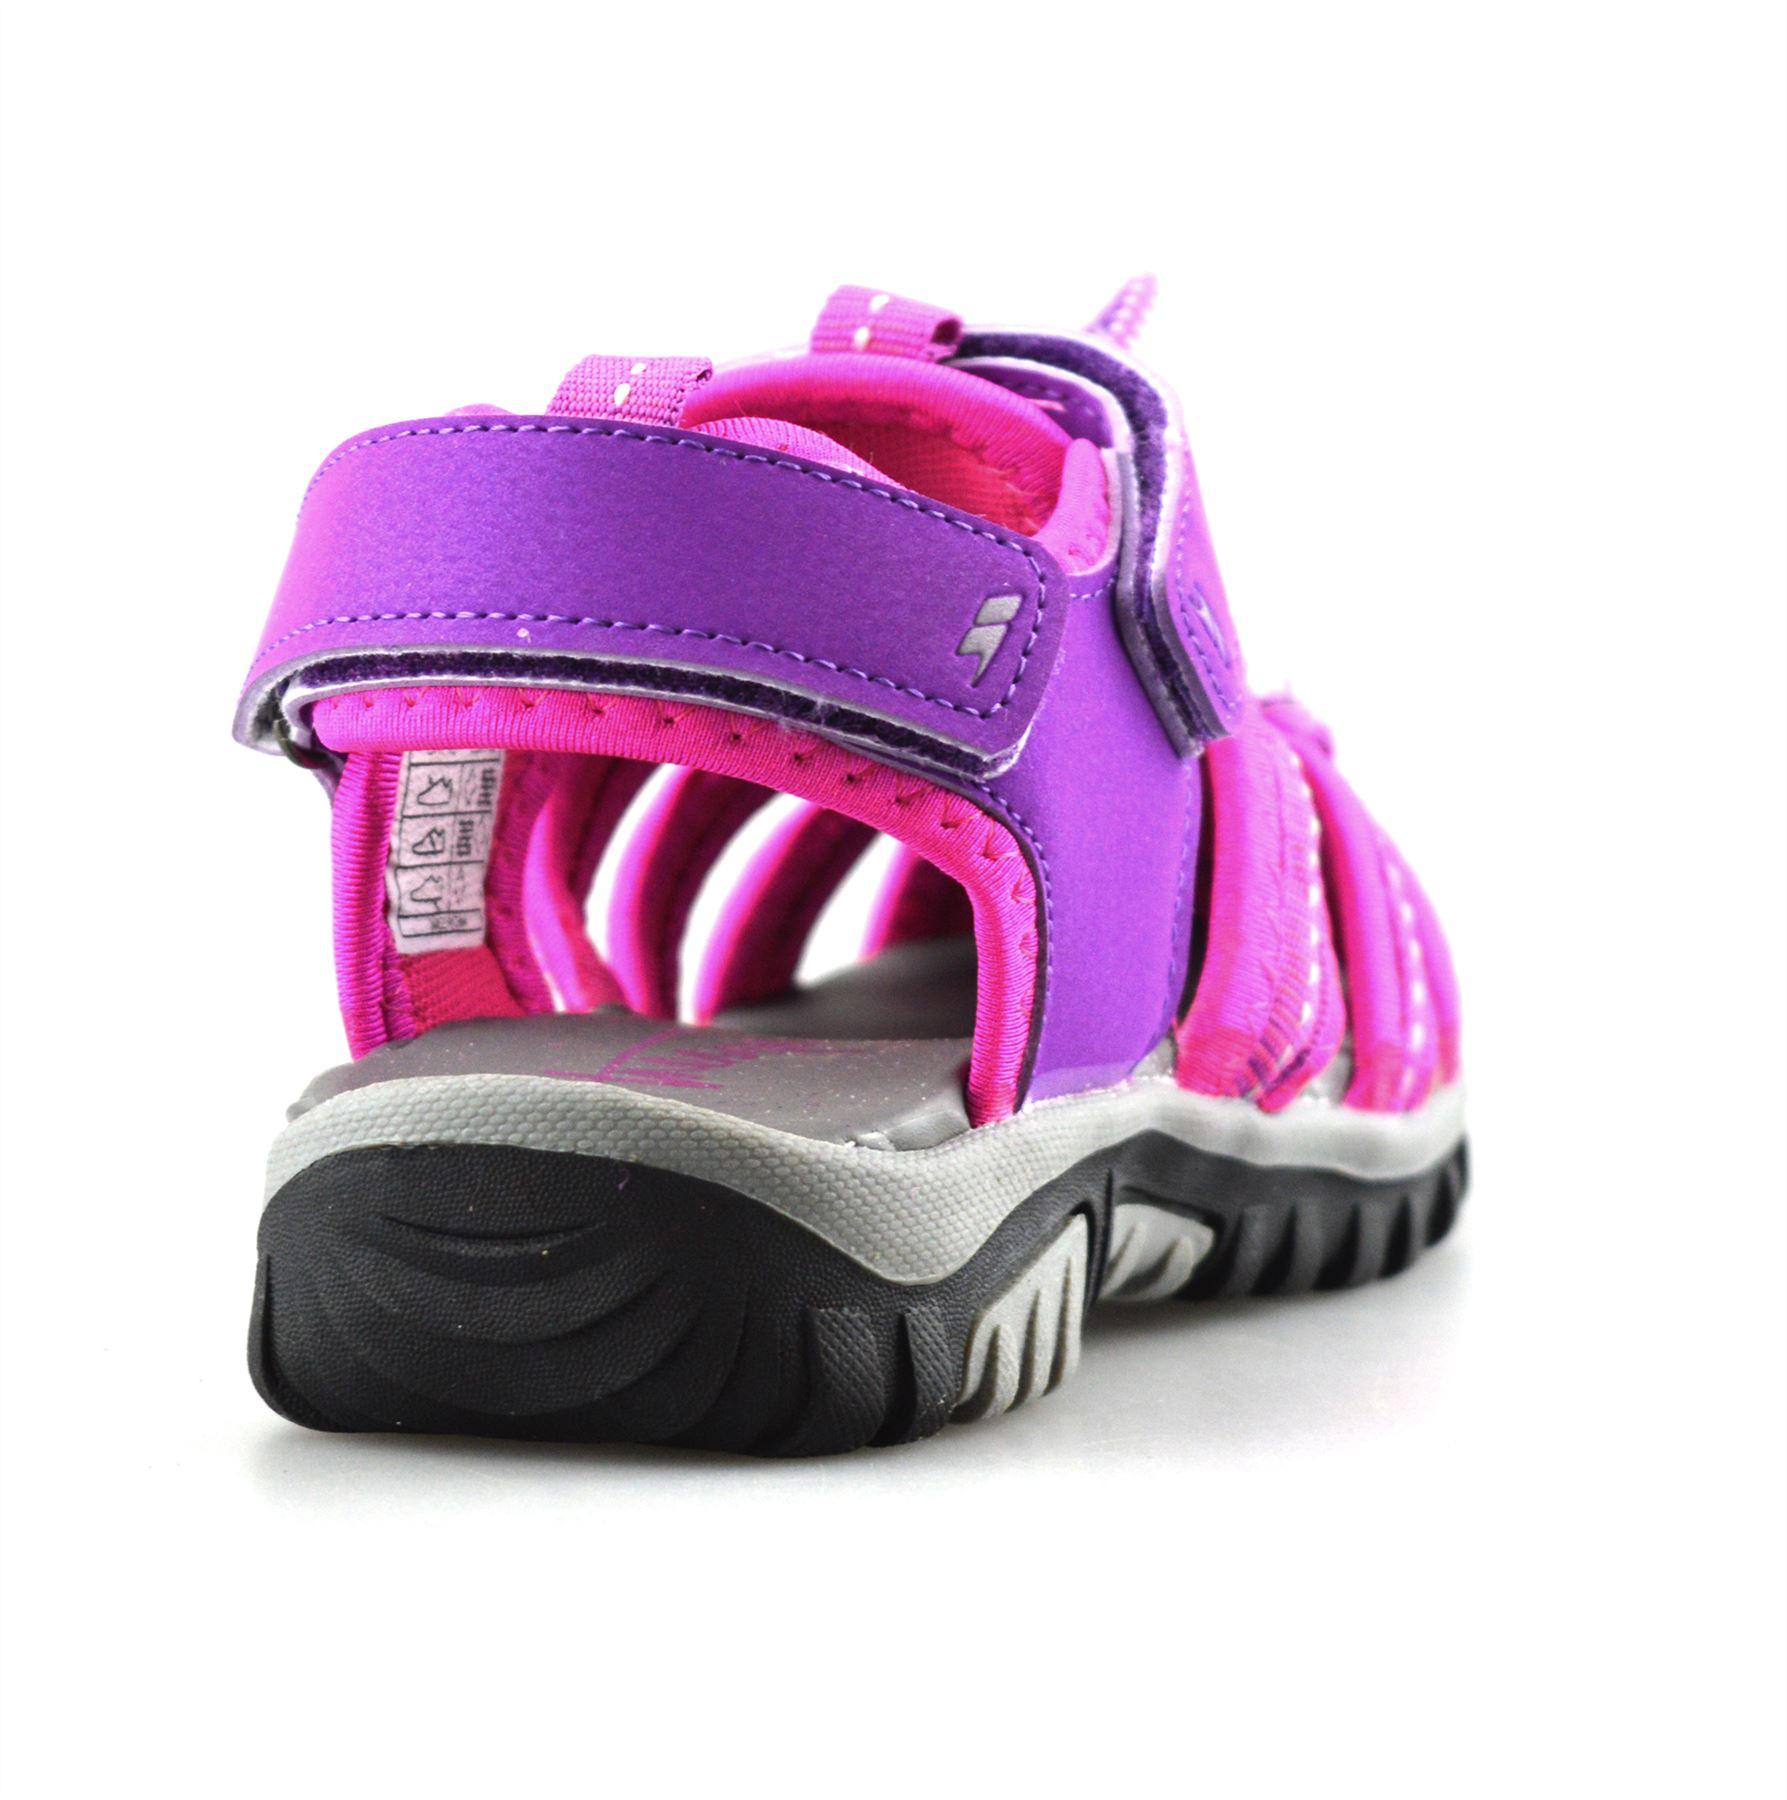 Boys-Girls-Kids-Trespass-Summer-Beach-Casual-Walking-Sports-Sandals-Shoes-Size thumbnail 18